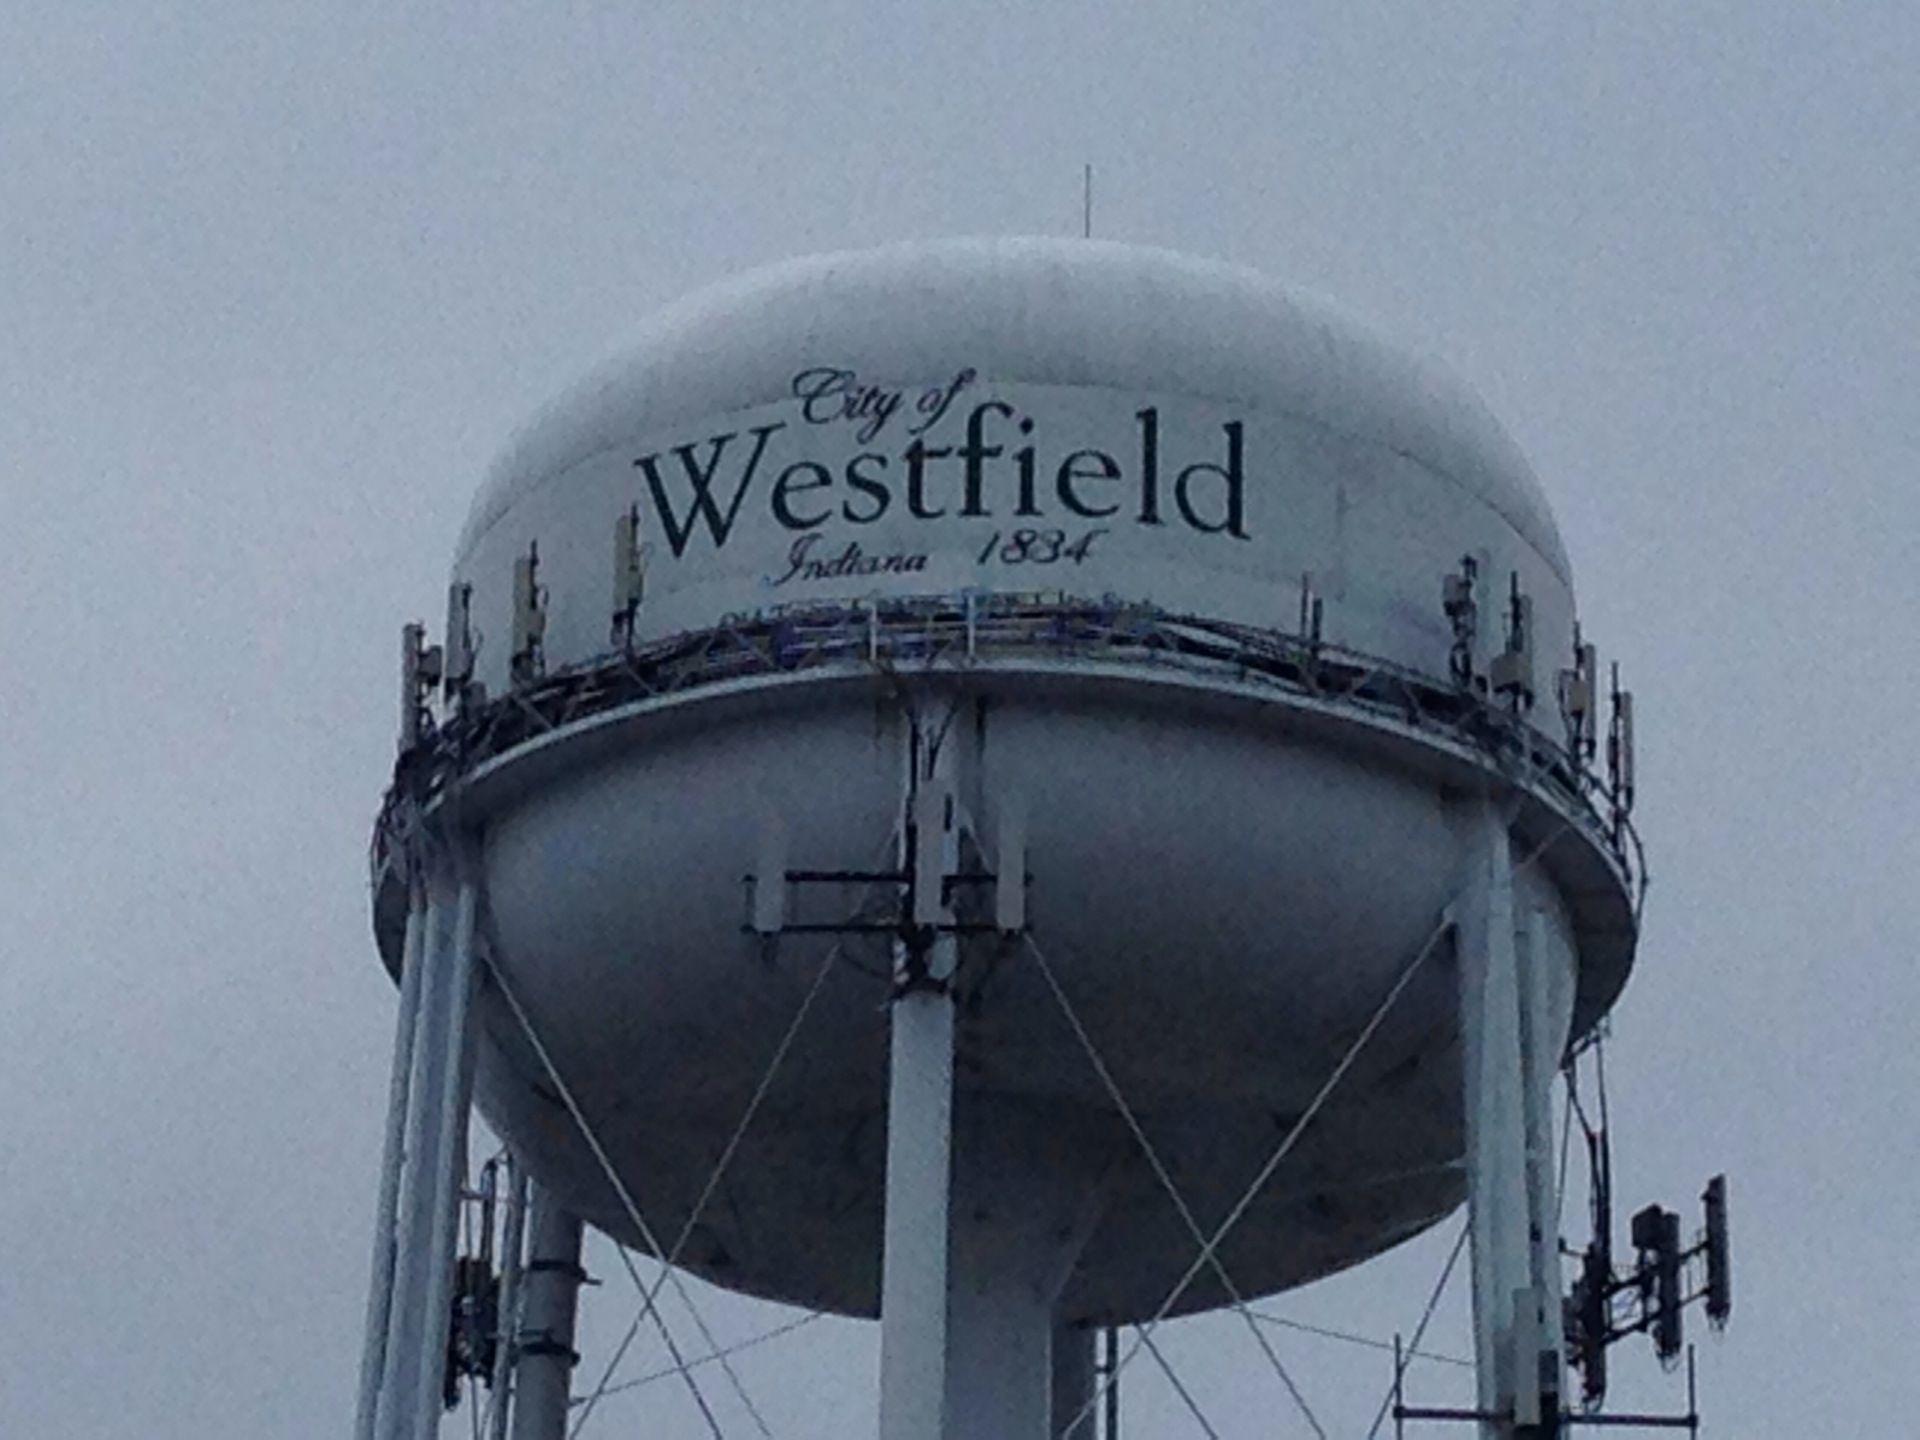 City of westfield westfield city westfield indiana